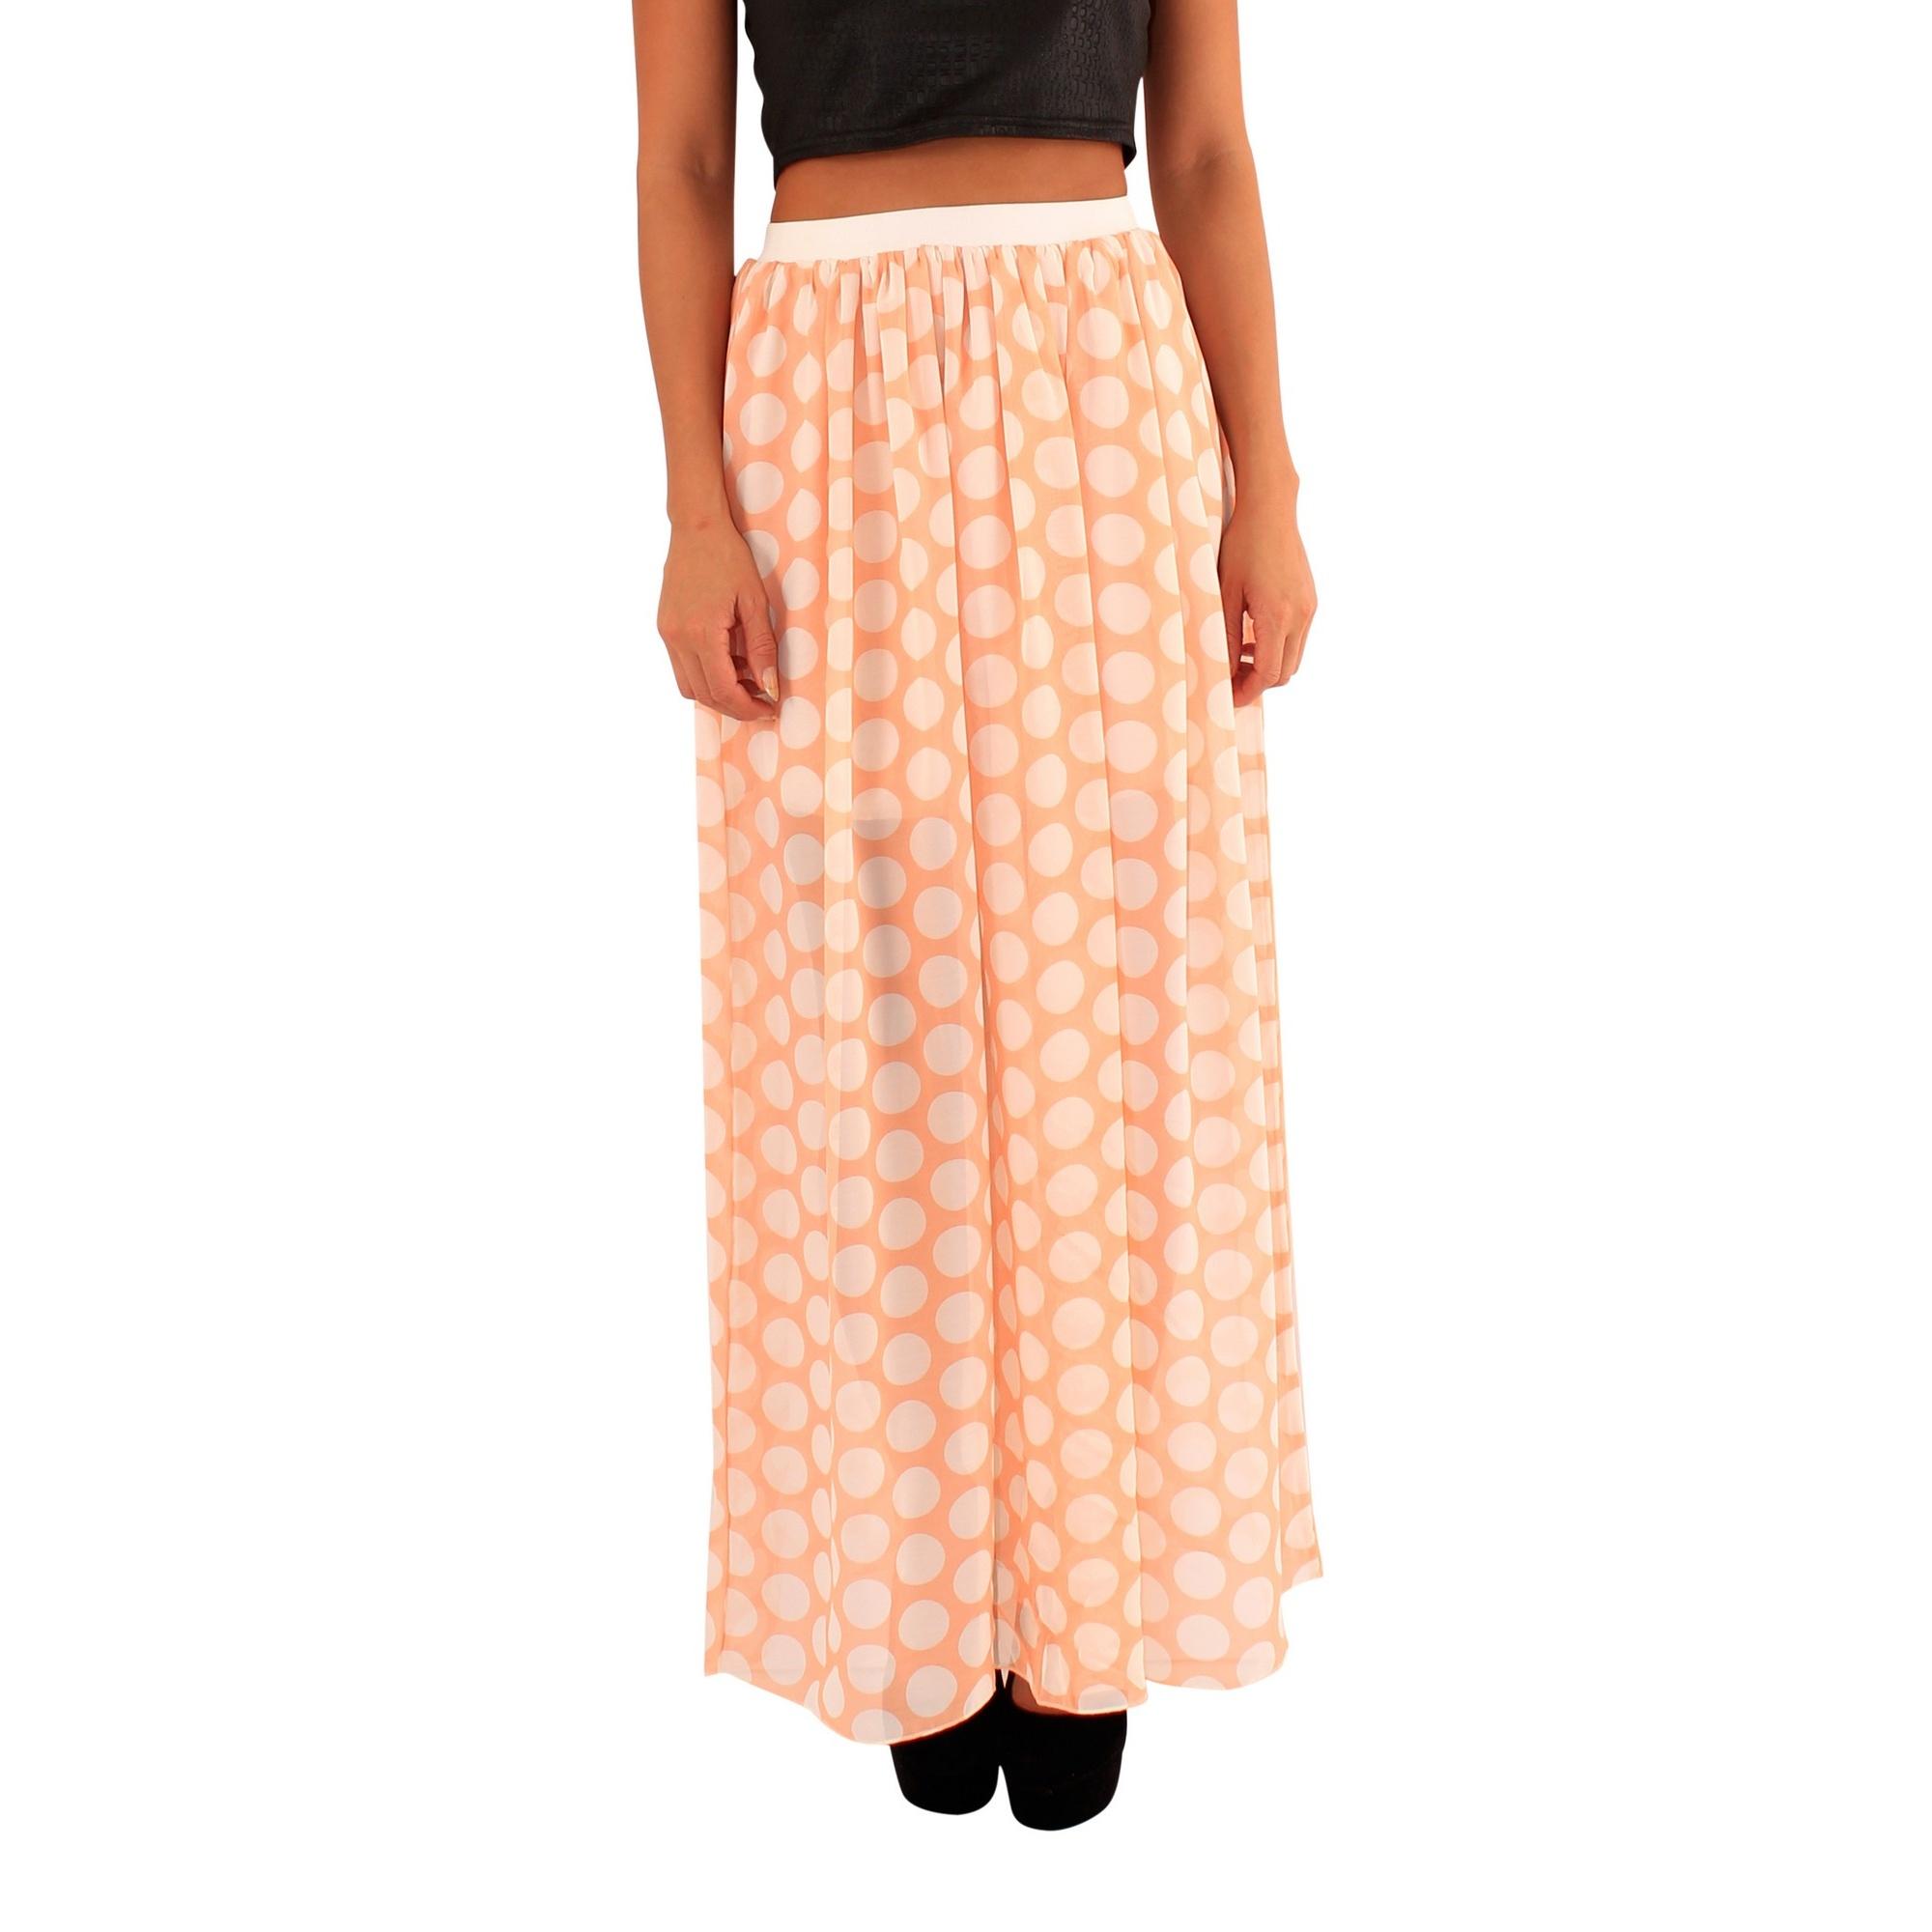 Lili London Womens/Ladies Mandy Polka Dot Maxi Skirt (M/L) (Coral)